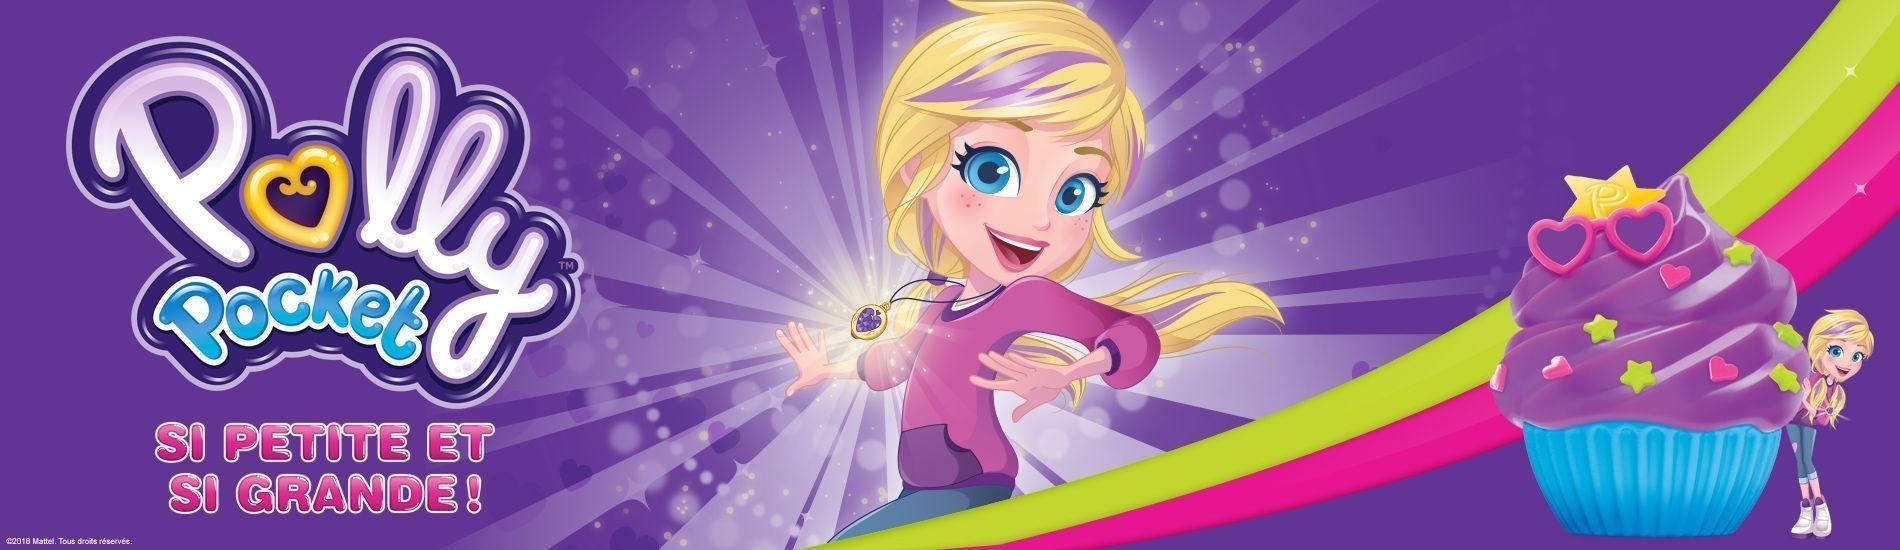 Polly Pocket en streaming sur Gulli Replay